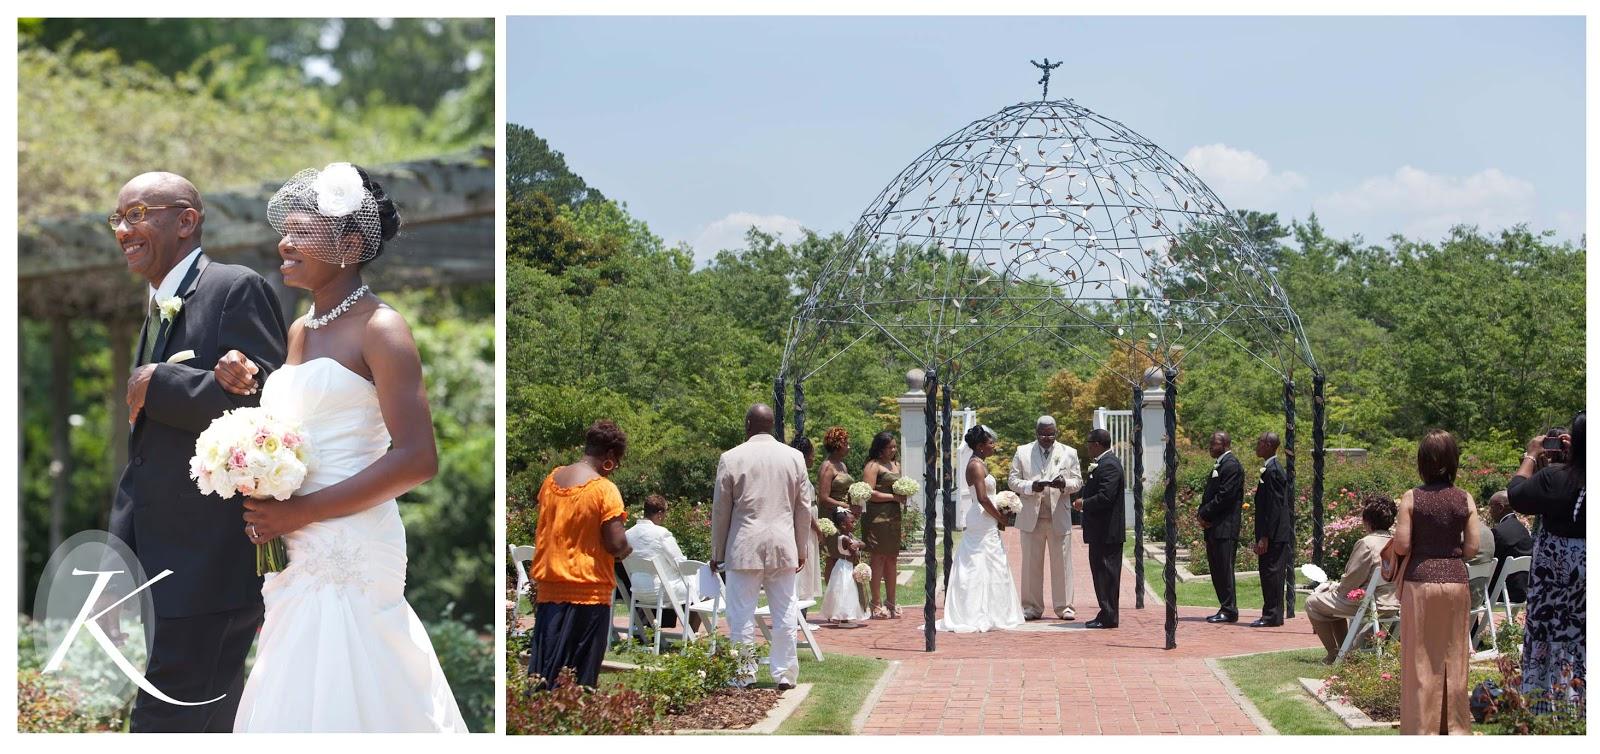 Merritt Wedding : Birmingham Botanical Gardens : Birmingham, AL Wedding  Photography